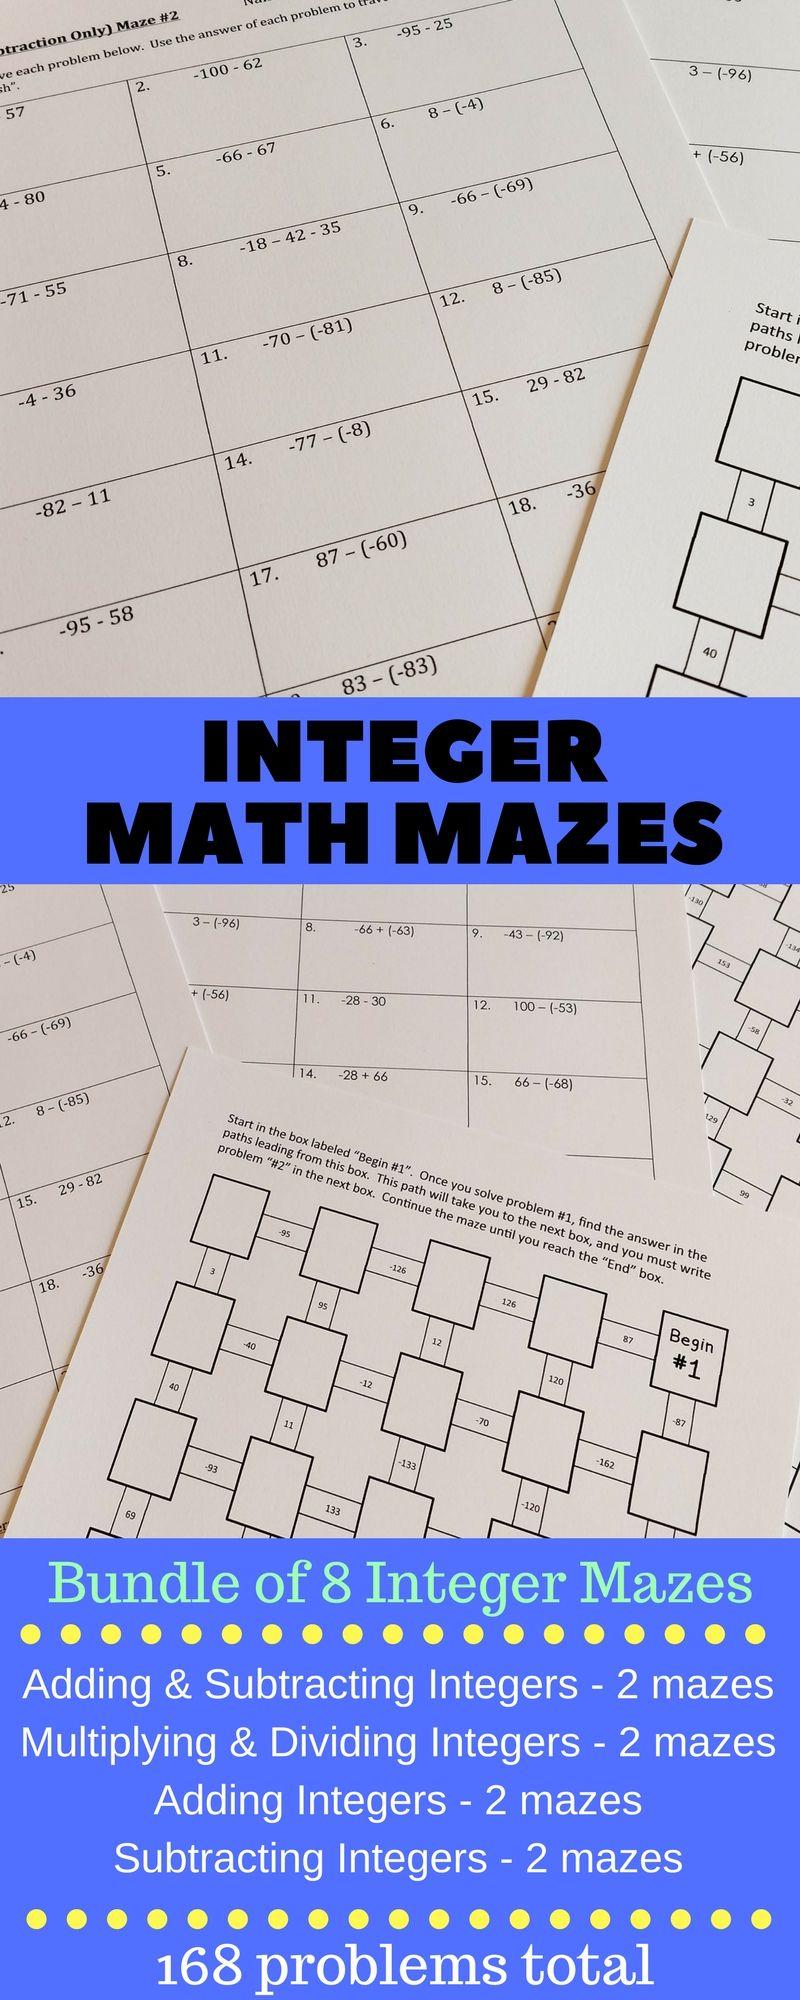 Integers Maze Bundle 8 Math Mazes With A Total Of 168 Integer Problems Mazes For Adding Integers Subtracting Integers Math Integers Integers Education Math Adding integers super teacher